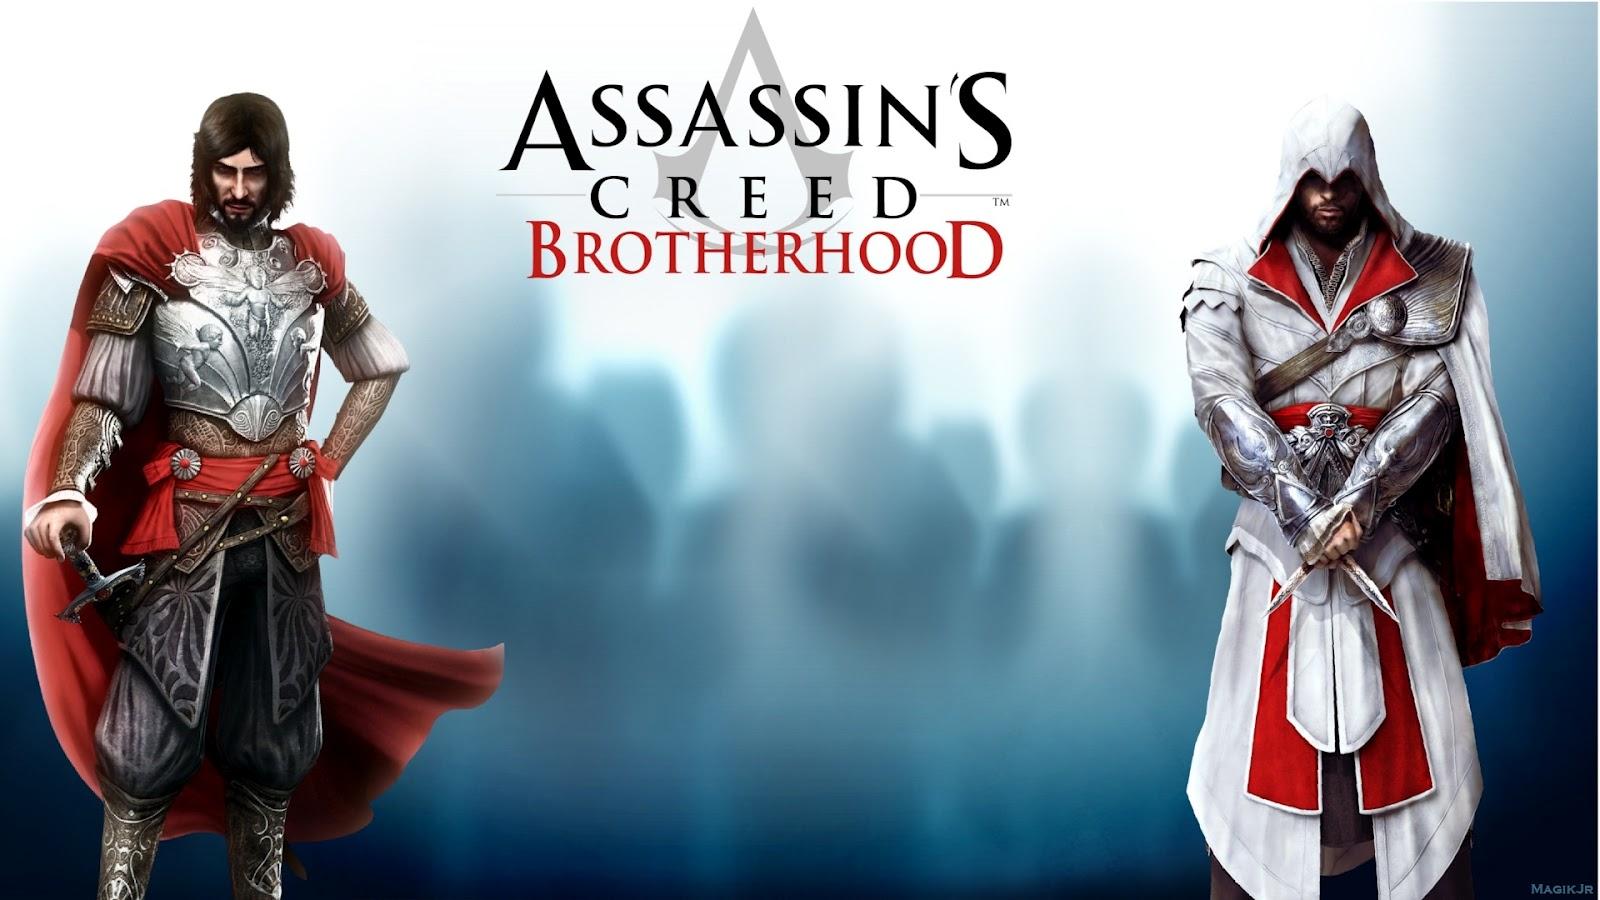 Assassins Creed Brotherhood Wallpaper: Assassin Creed Wallpapers